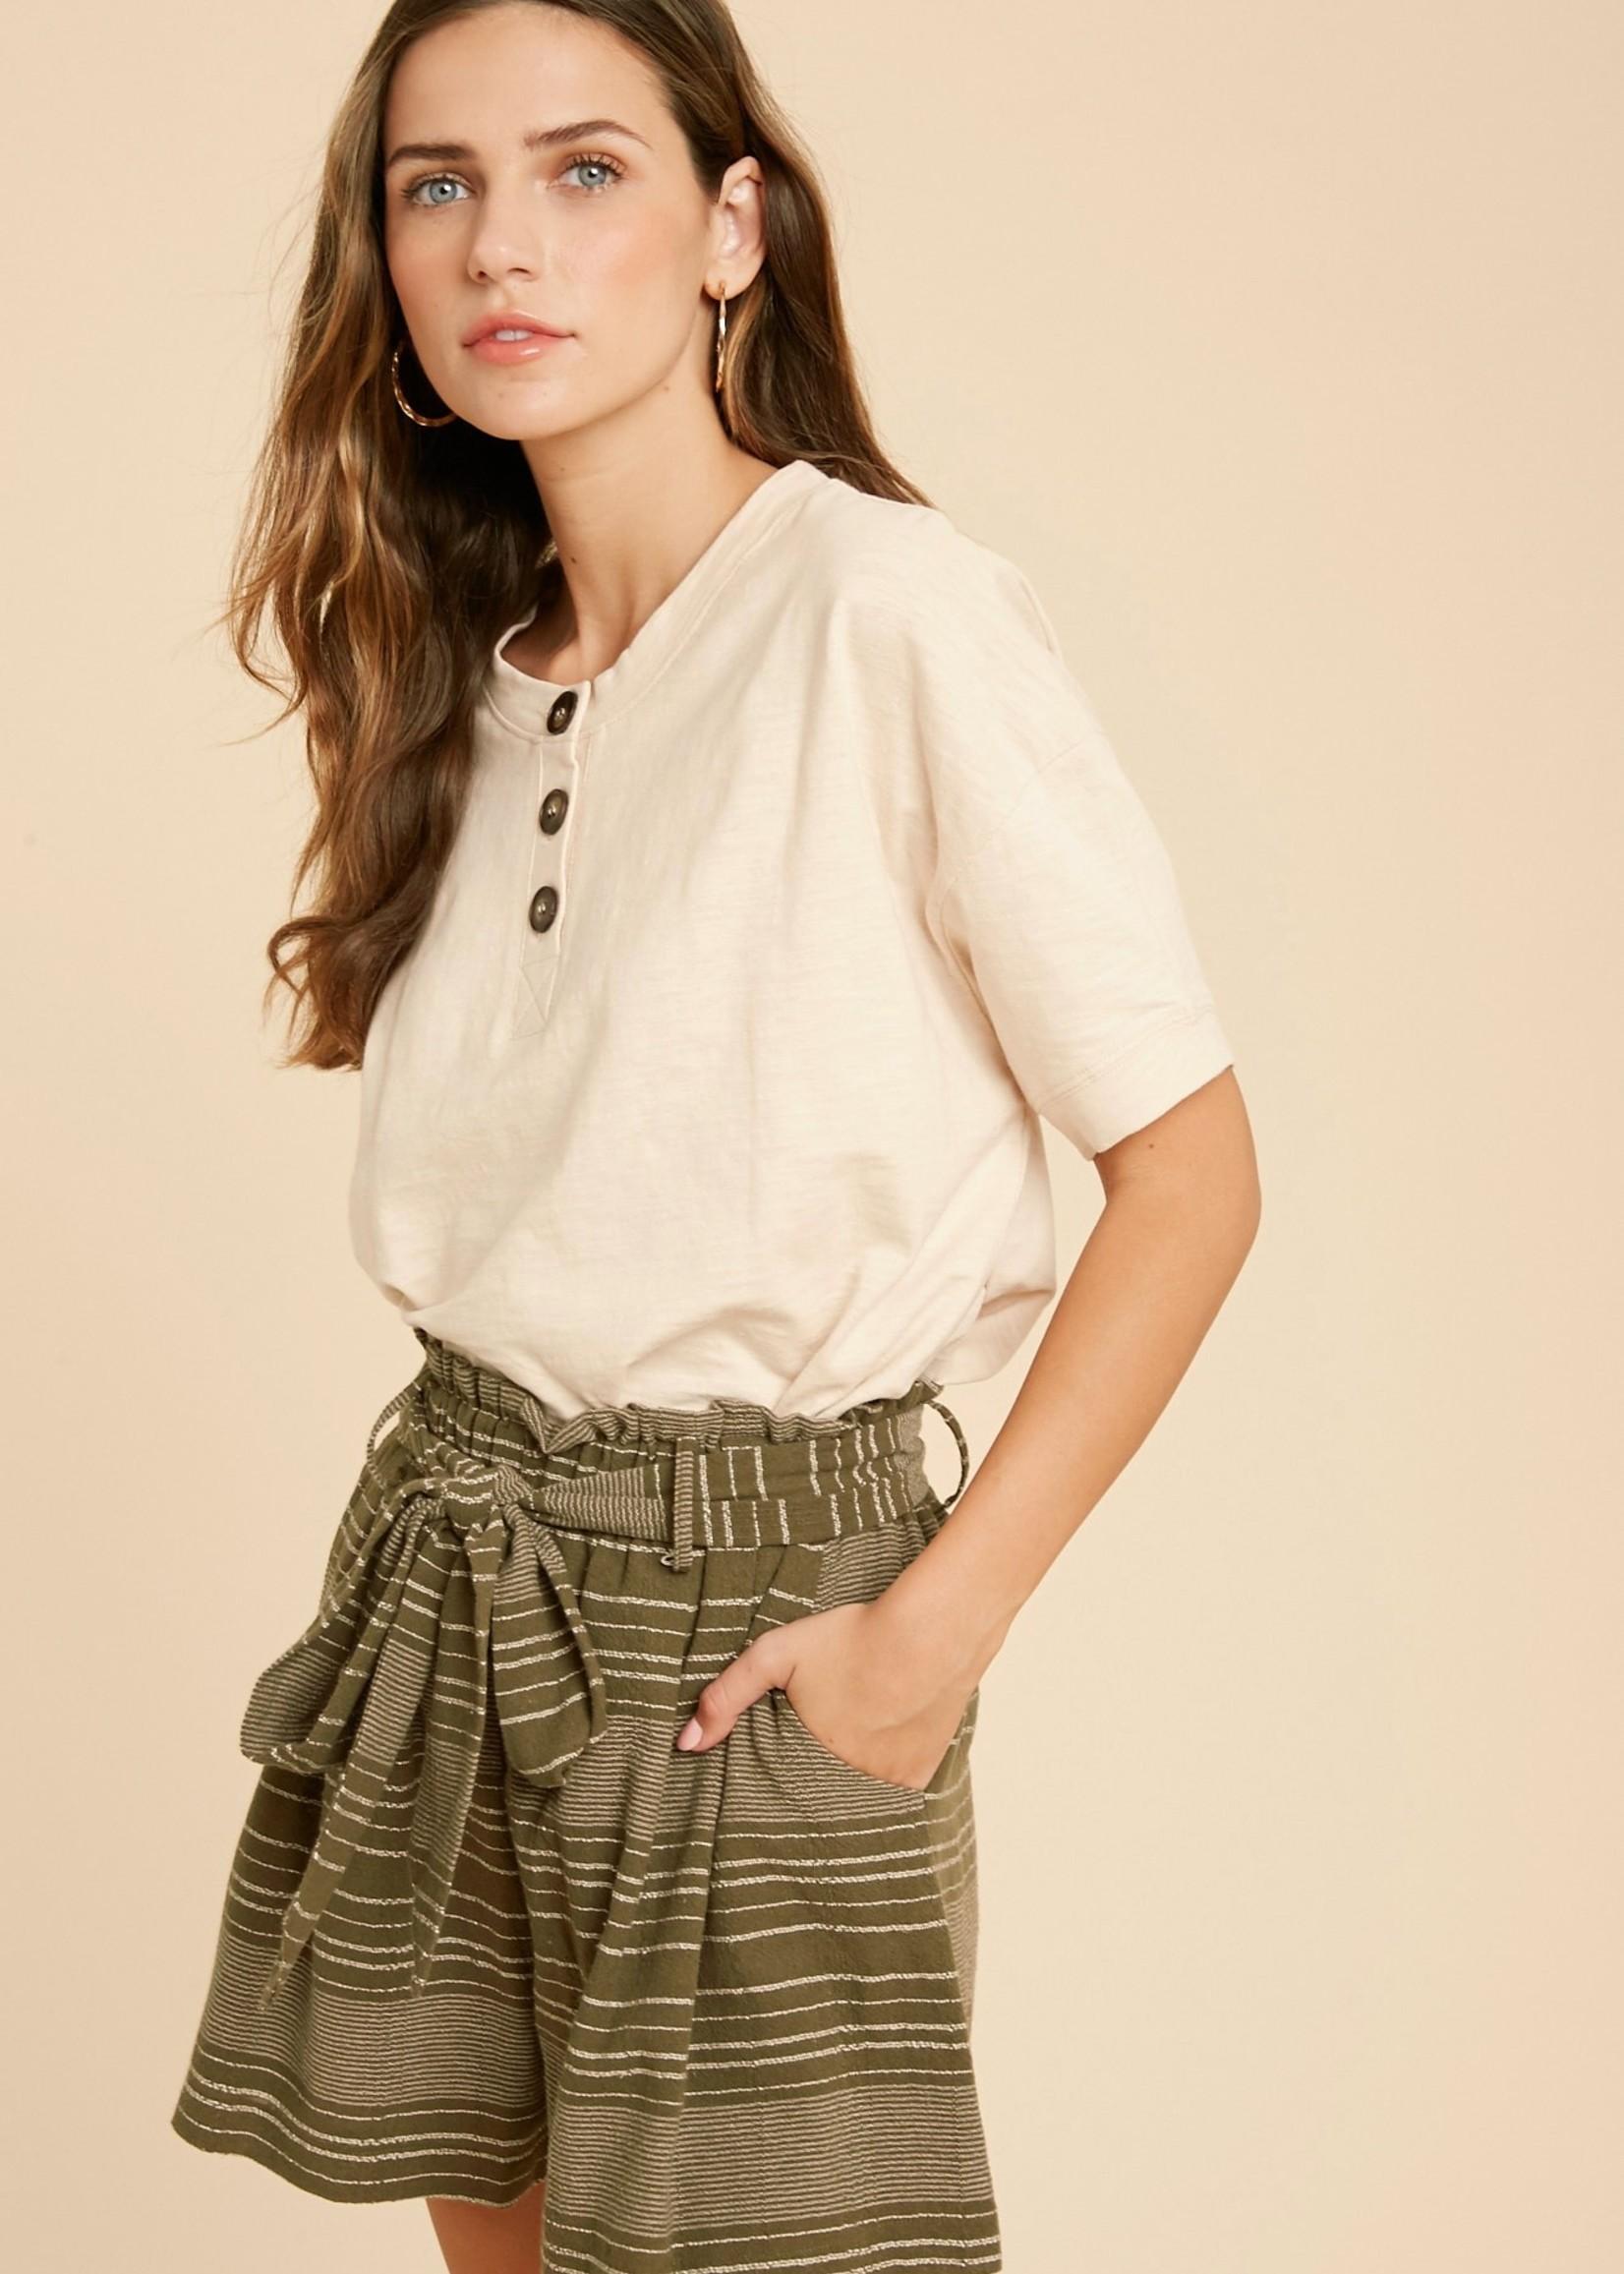 Short Sleeve Henley Knit Top - Blush